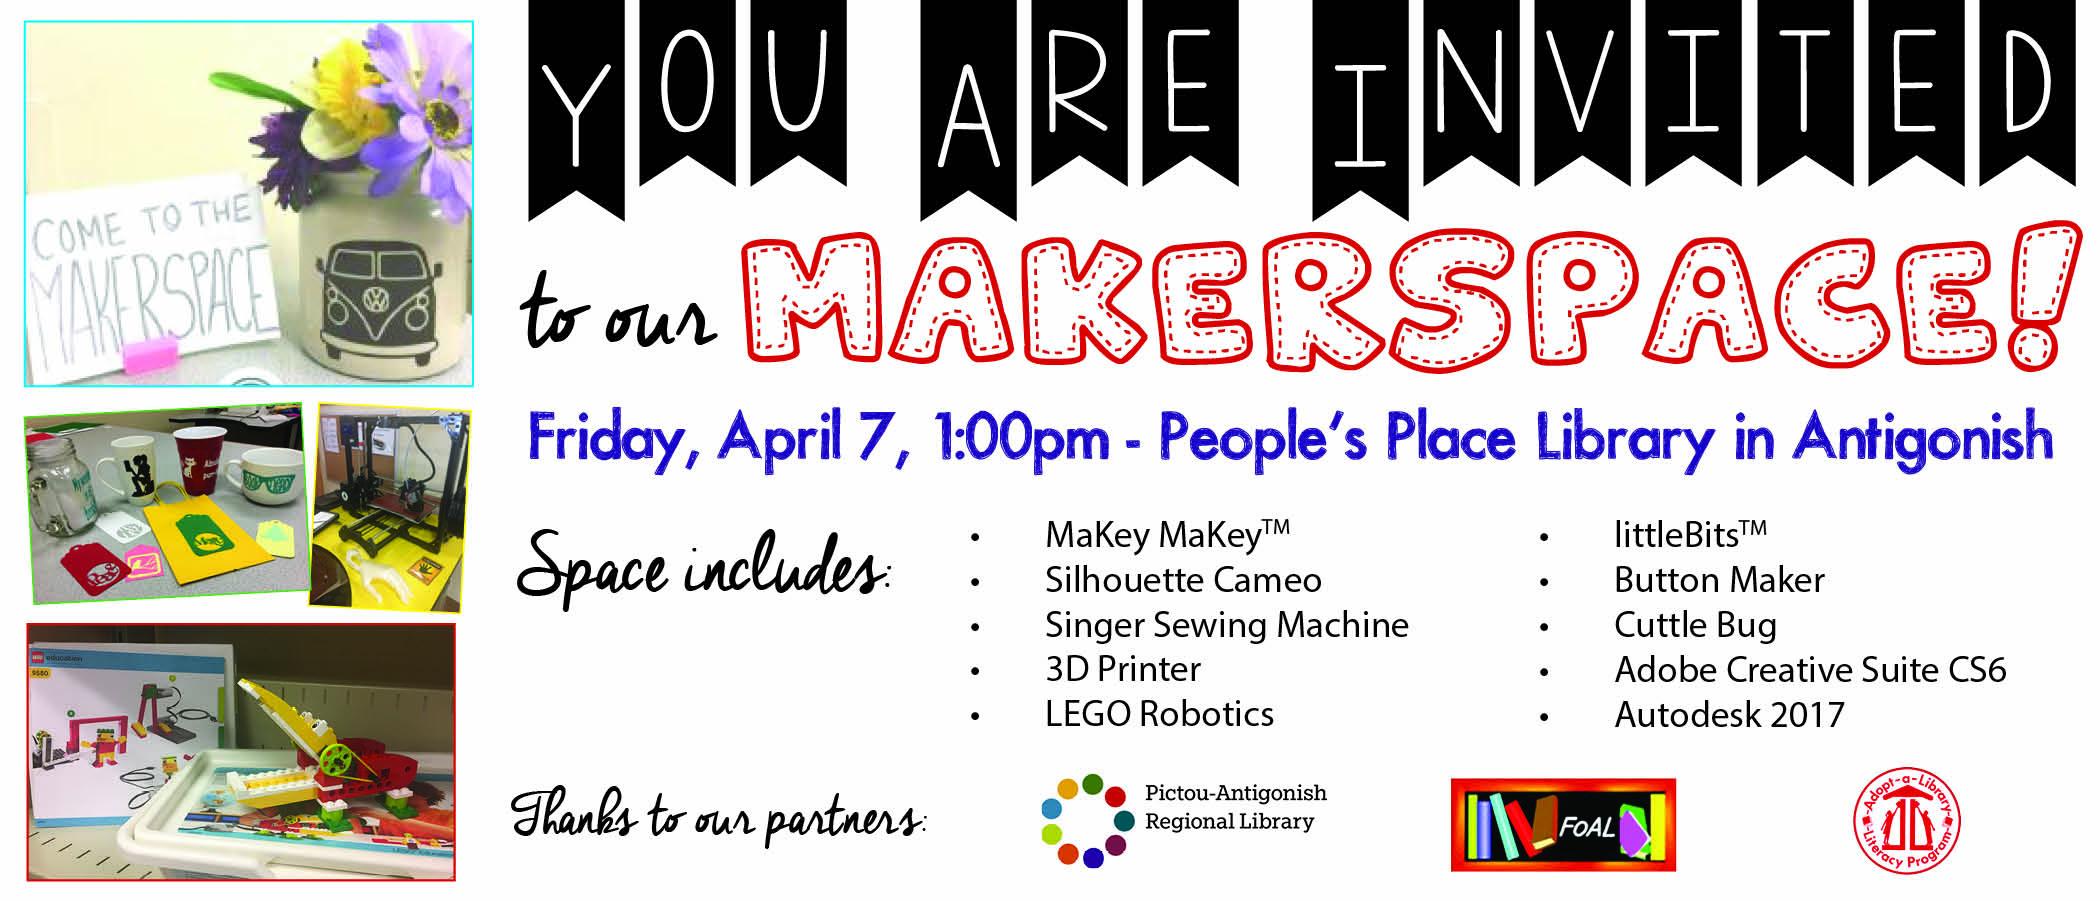 989 xfm invitation for makerspace draft stopboris Images